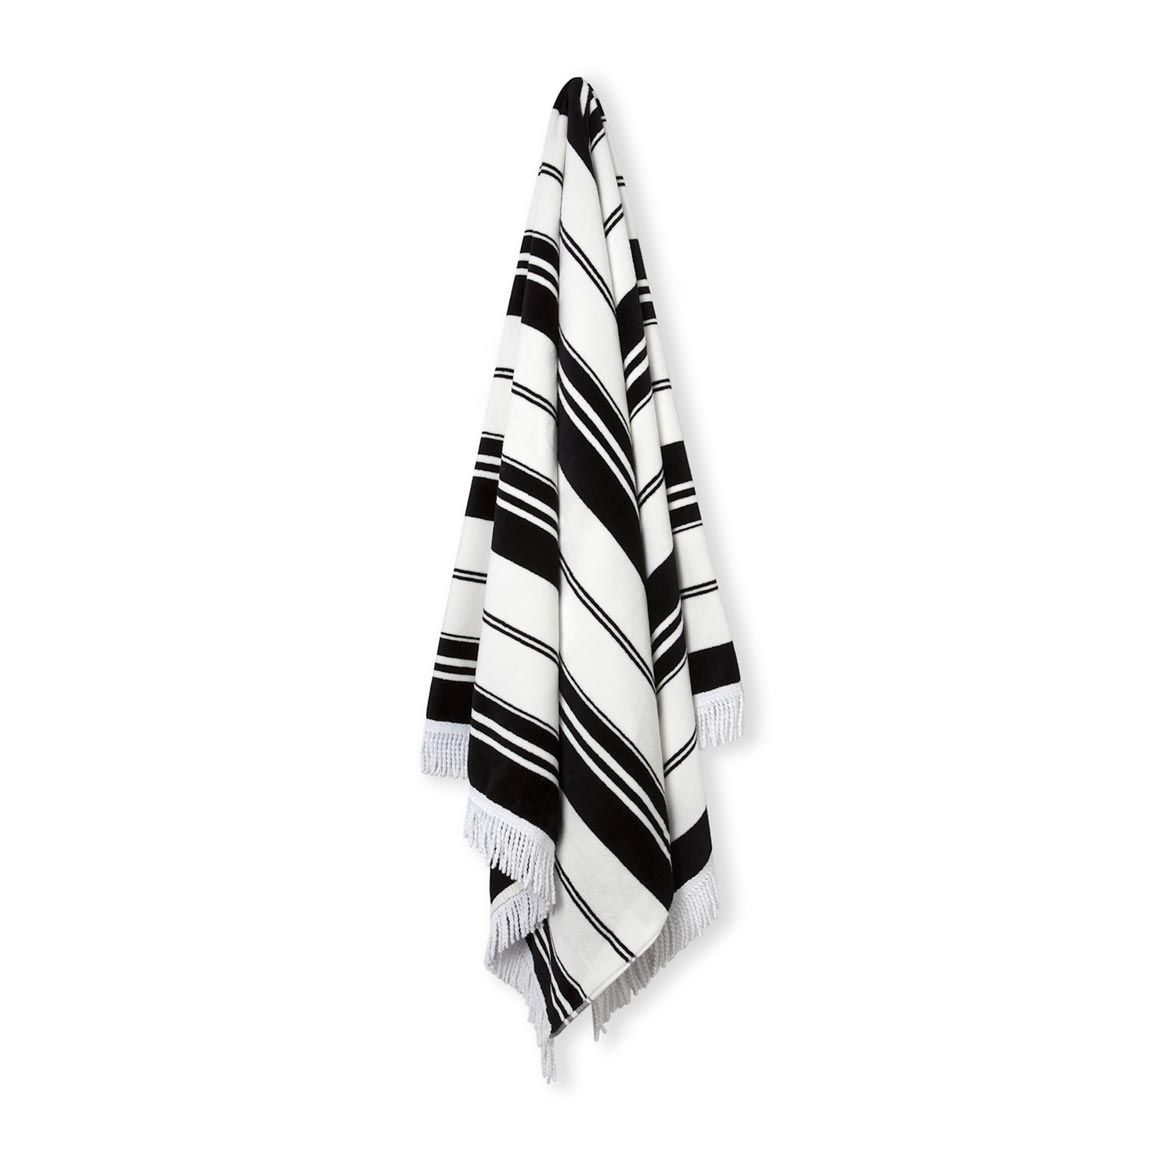 Country Road Beach Towel Blackandwhite Beach Towel Cotton Beach Towel Towel